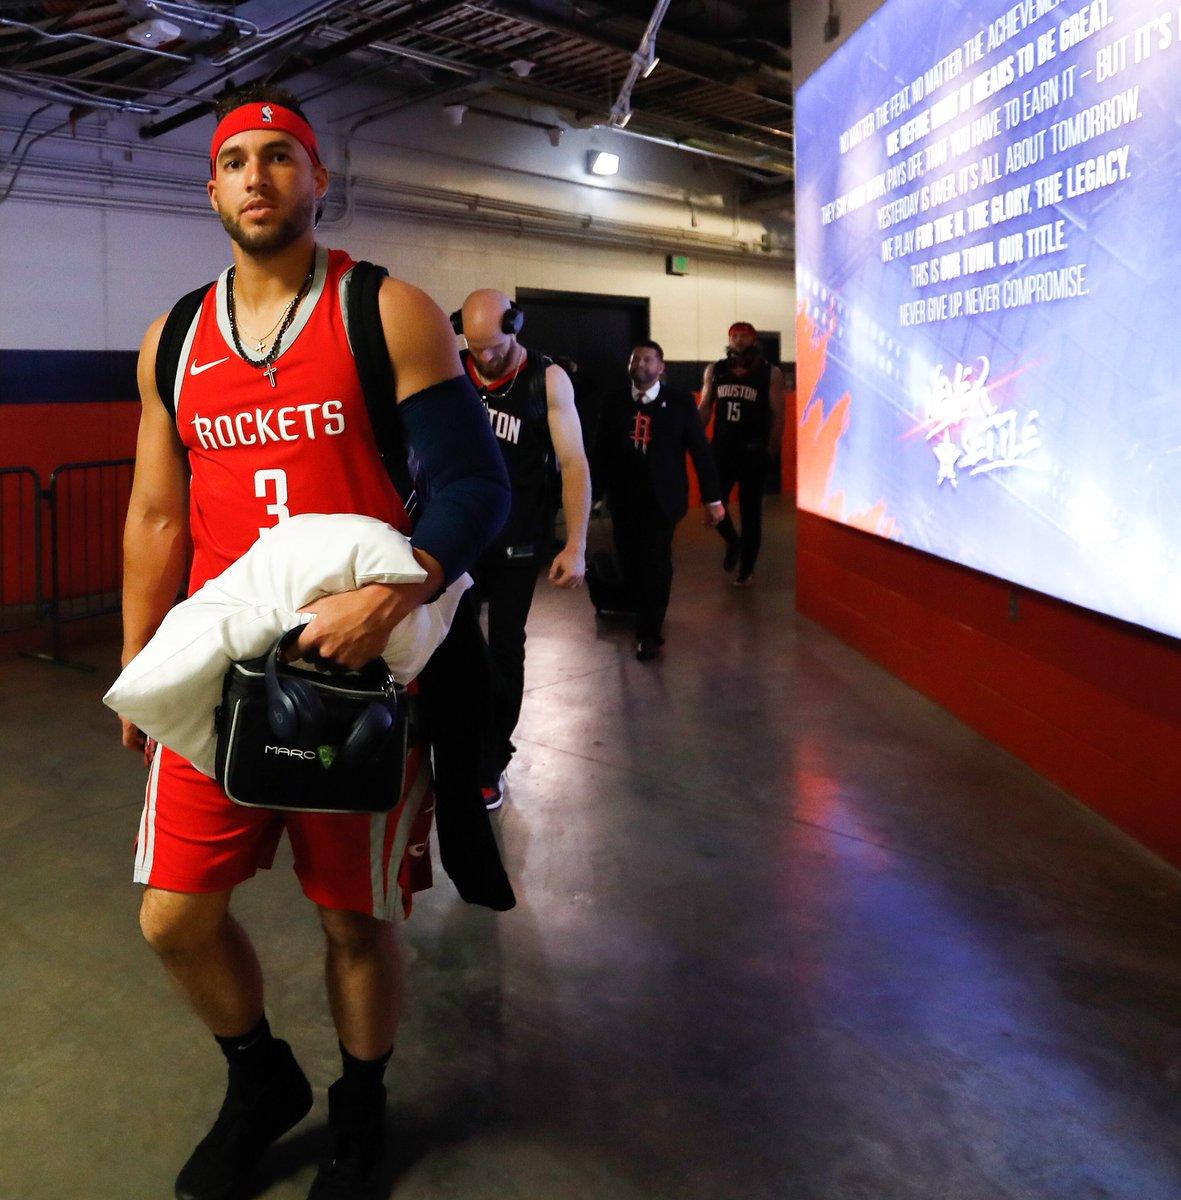 24a63a61f8c @Astros players head off to LA wearing @Rockets gear  #NBAFinalspic.twitter.com/x3aLS3jfYT